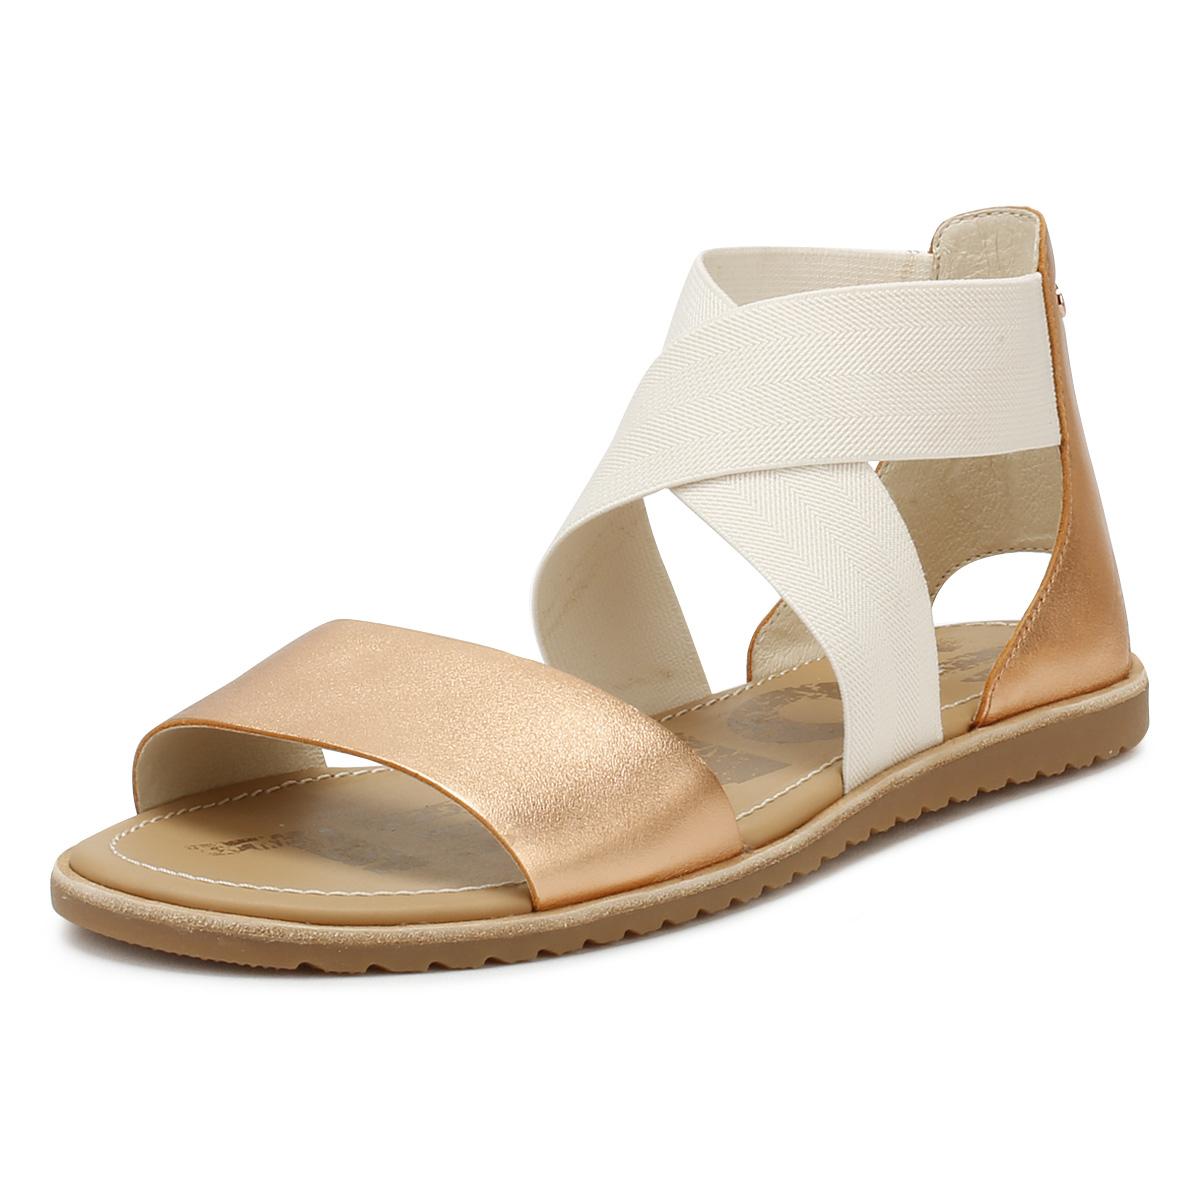 f0c36b98f8137 Details about Sorel Womens Natural Beige Ella Sandals Ladies Summer Beach  Casual Shoes